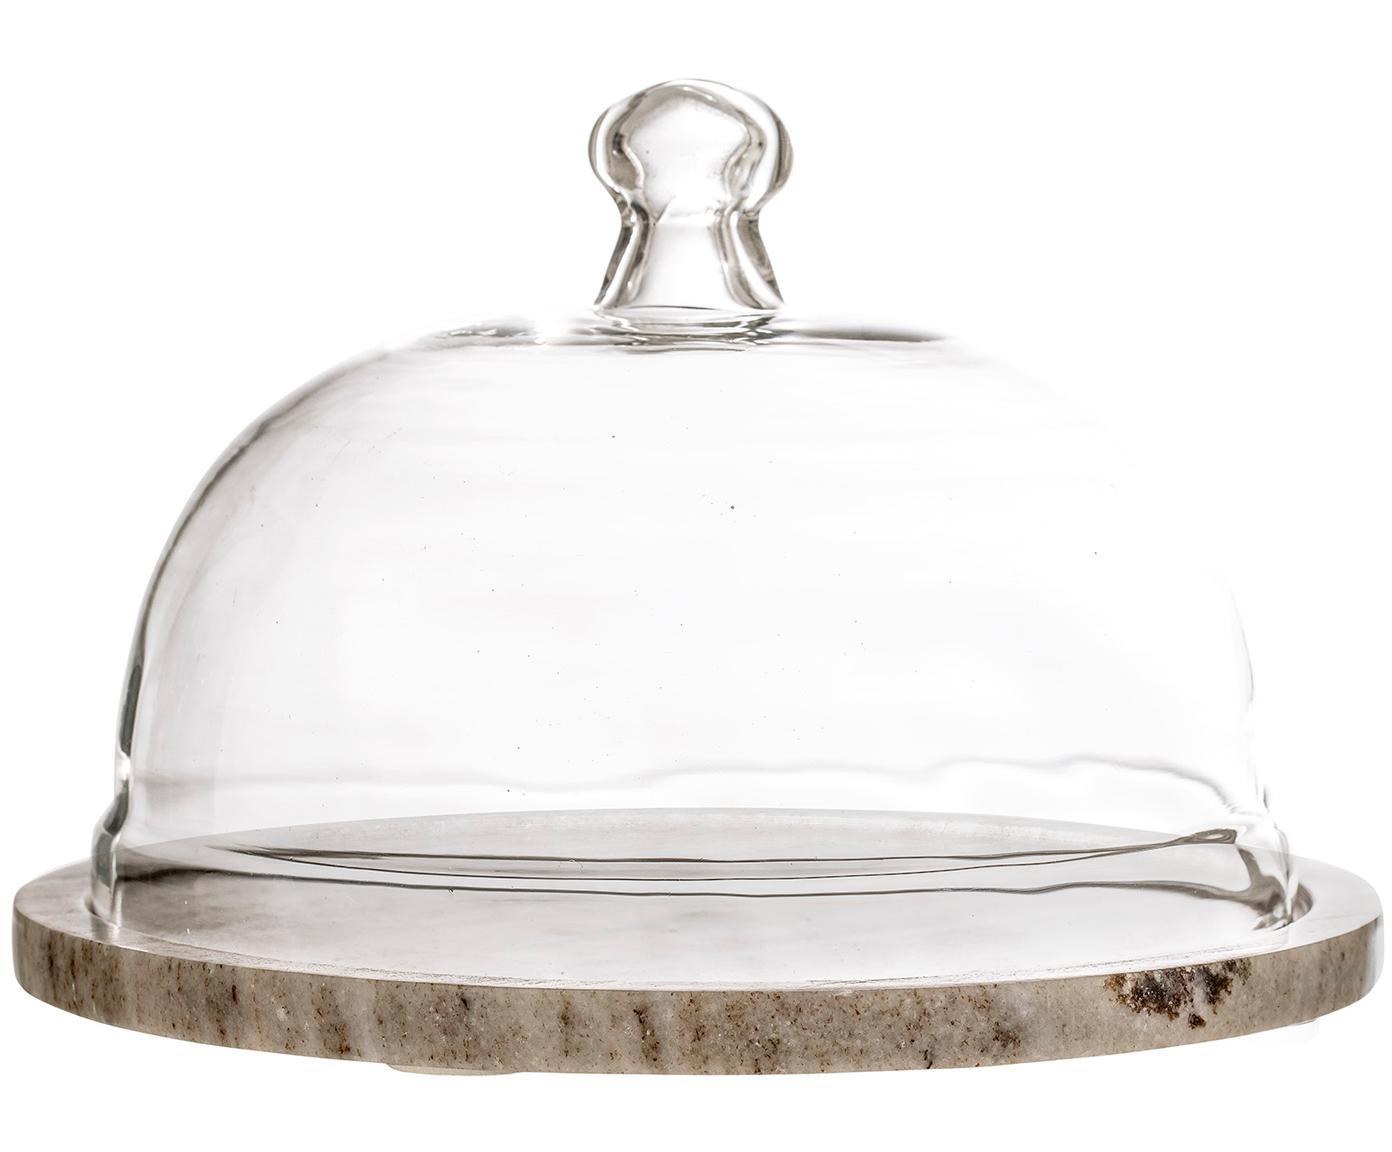 Marmeren kaasstolp Cheese, Stolp: glas, Plank: marmer, Beige, transparant, Ø 25 x H 14 cm